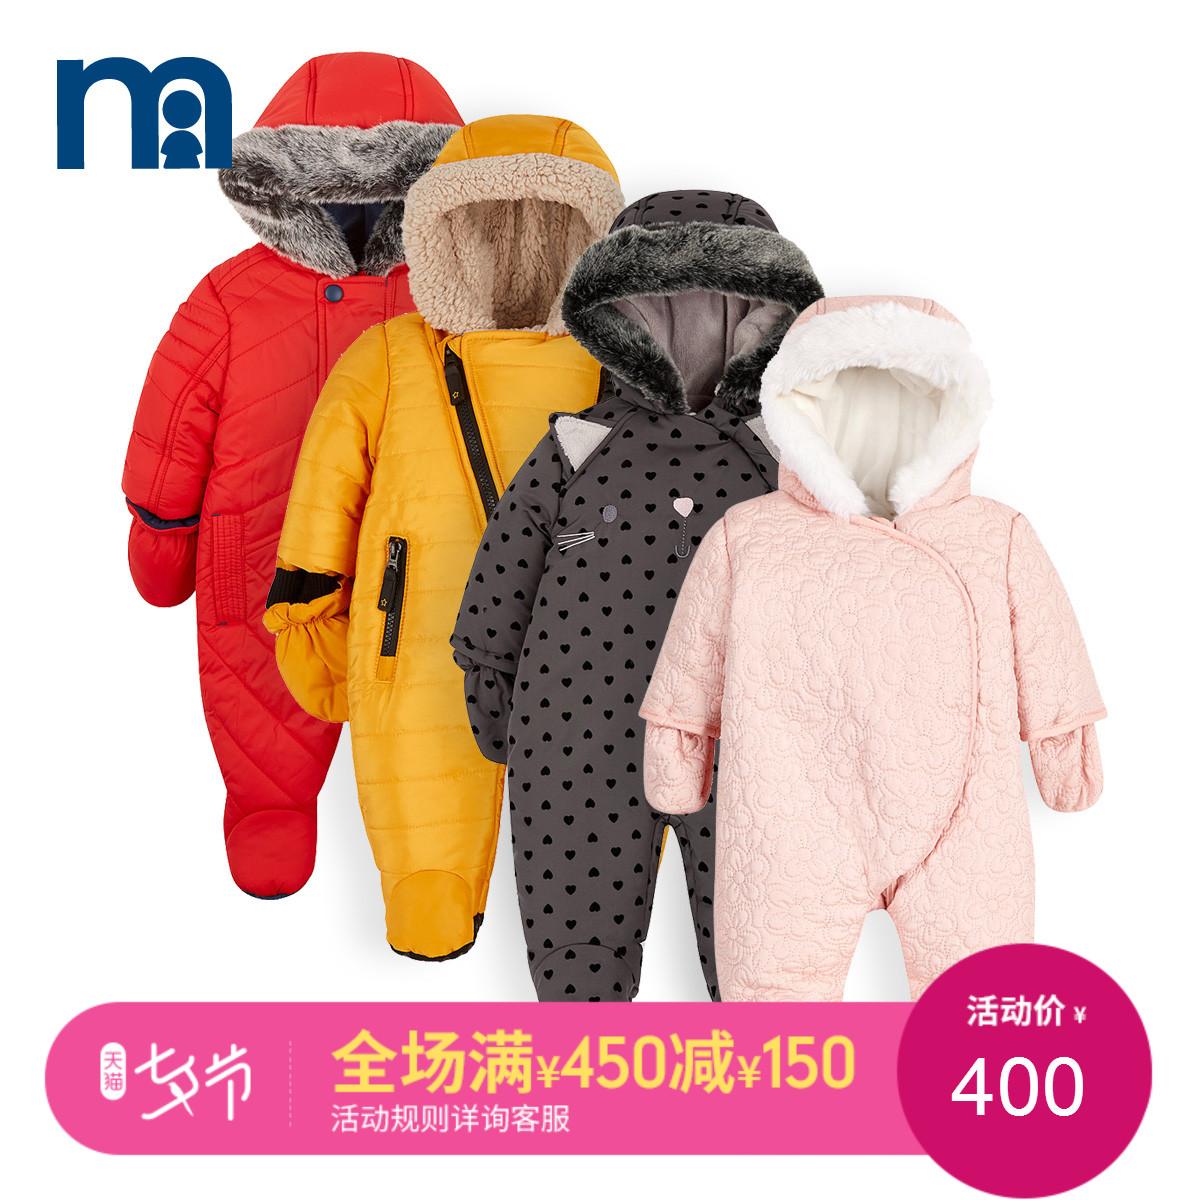 mothercare英国男女婴连体衣冬季加厚外穿保暖6-12月宝宝连体棉服